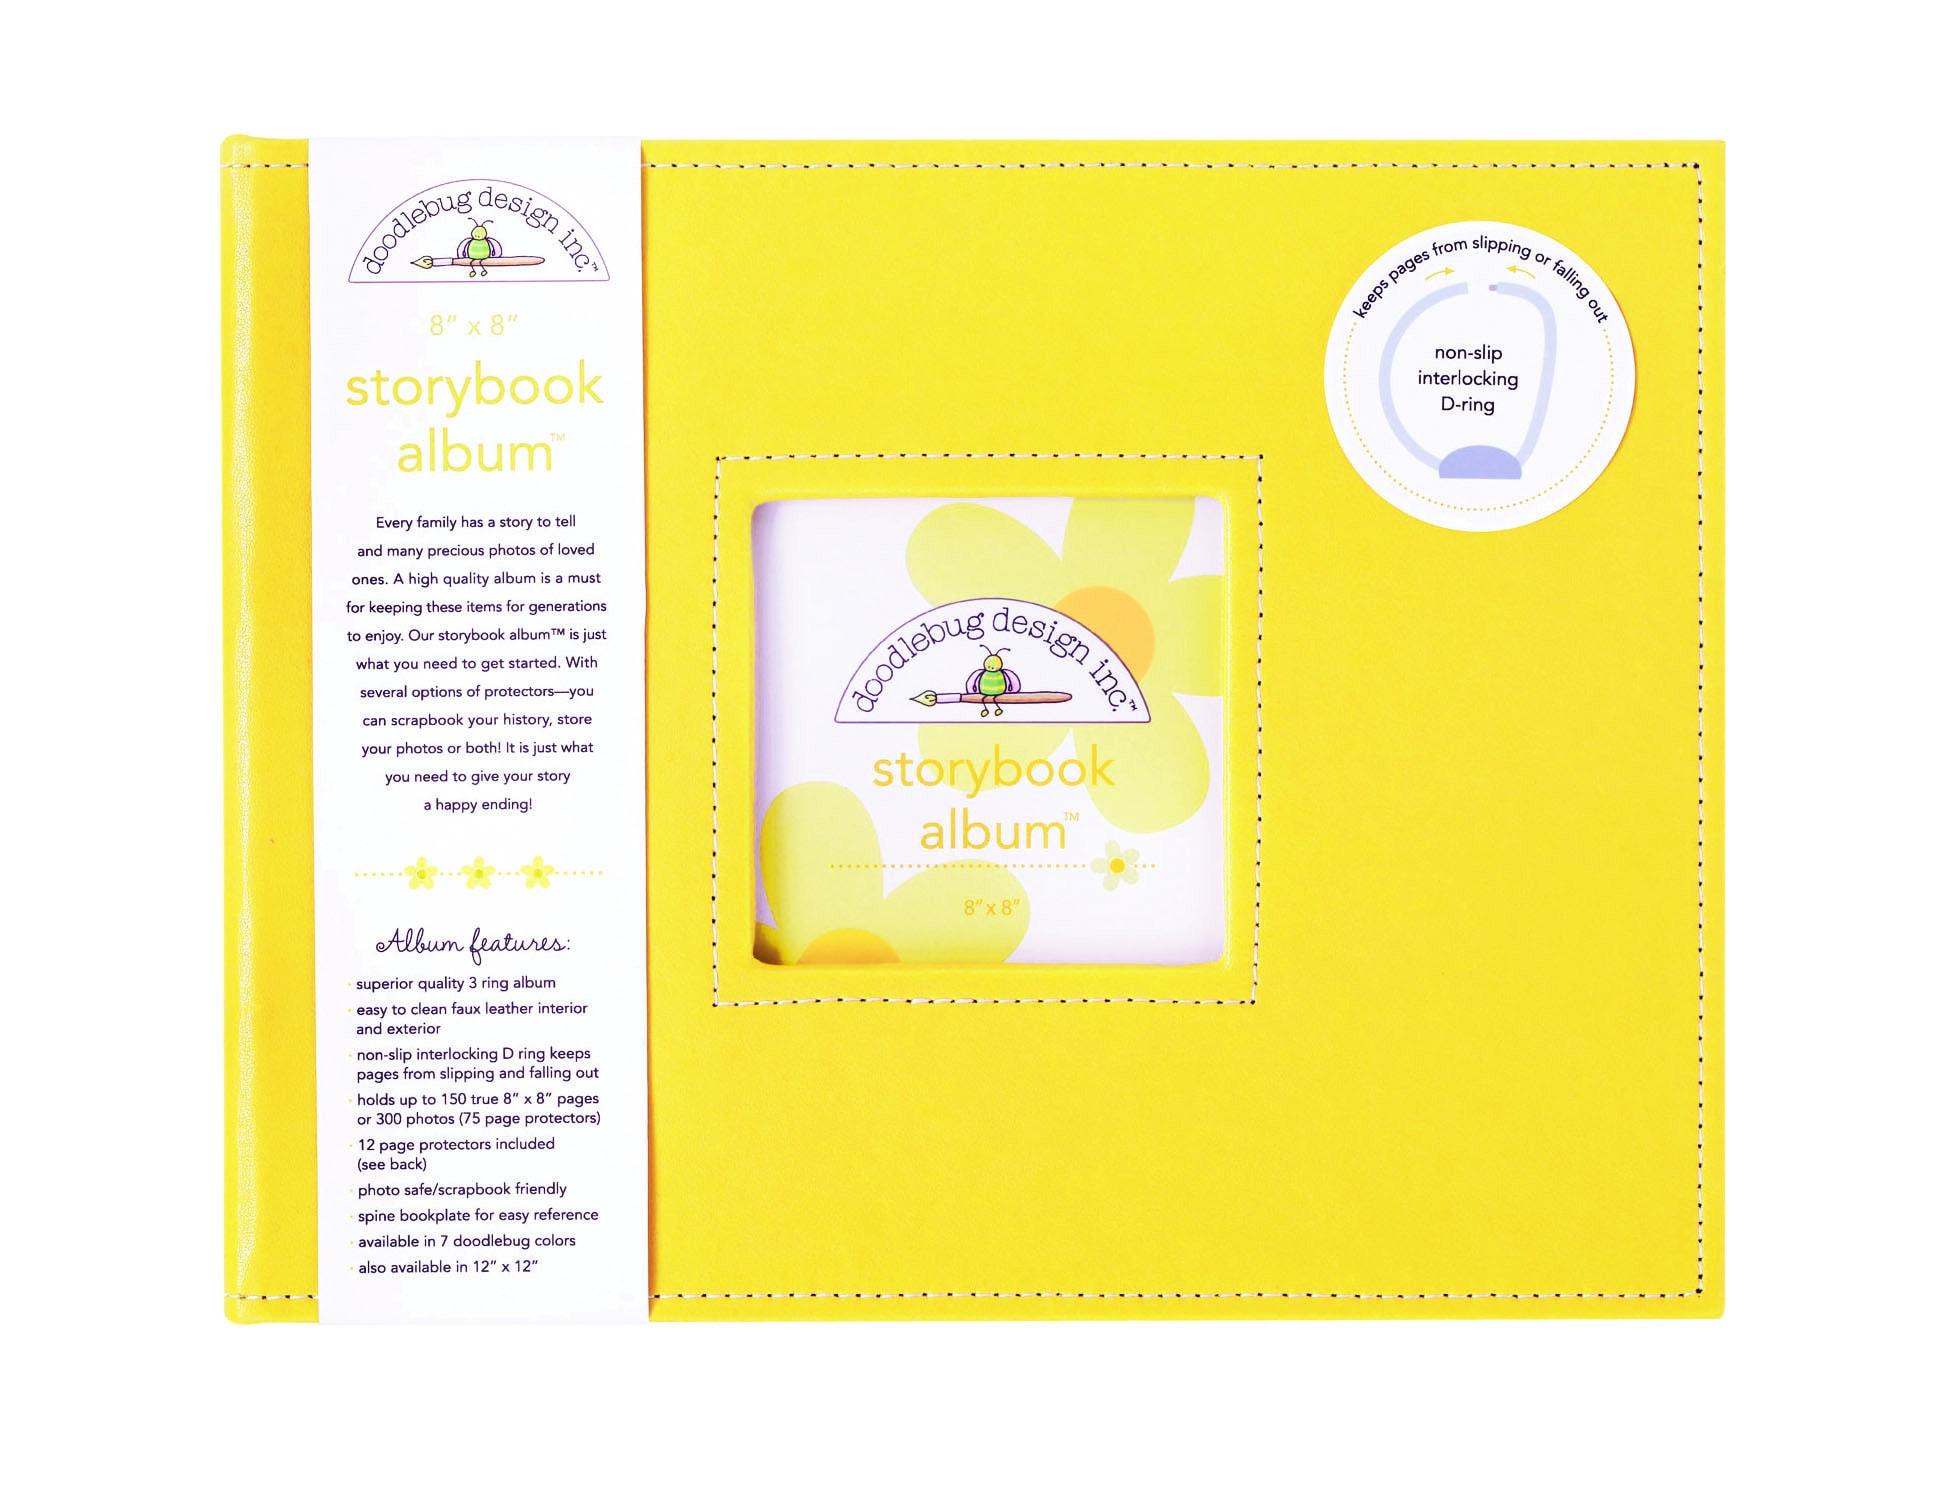 Doodlebug Bubblegum Pink Fabric 8 inch Storybook Album 2c1f1374 5bca 4f75 ad54 0a beede